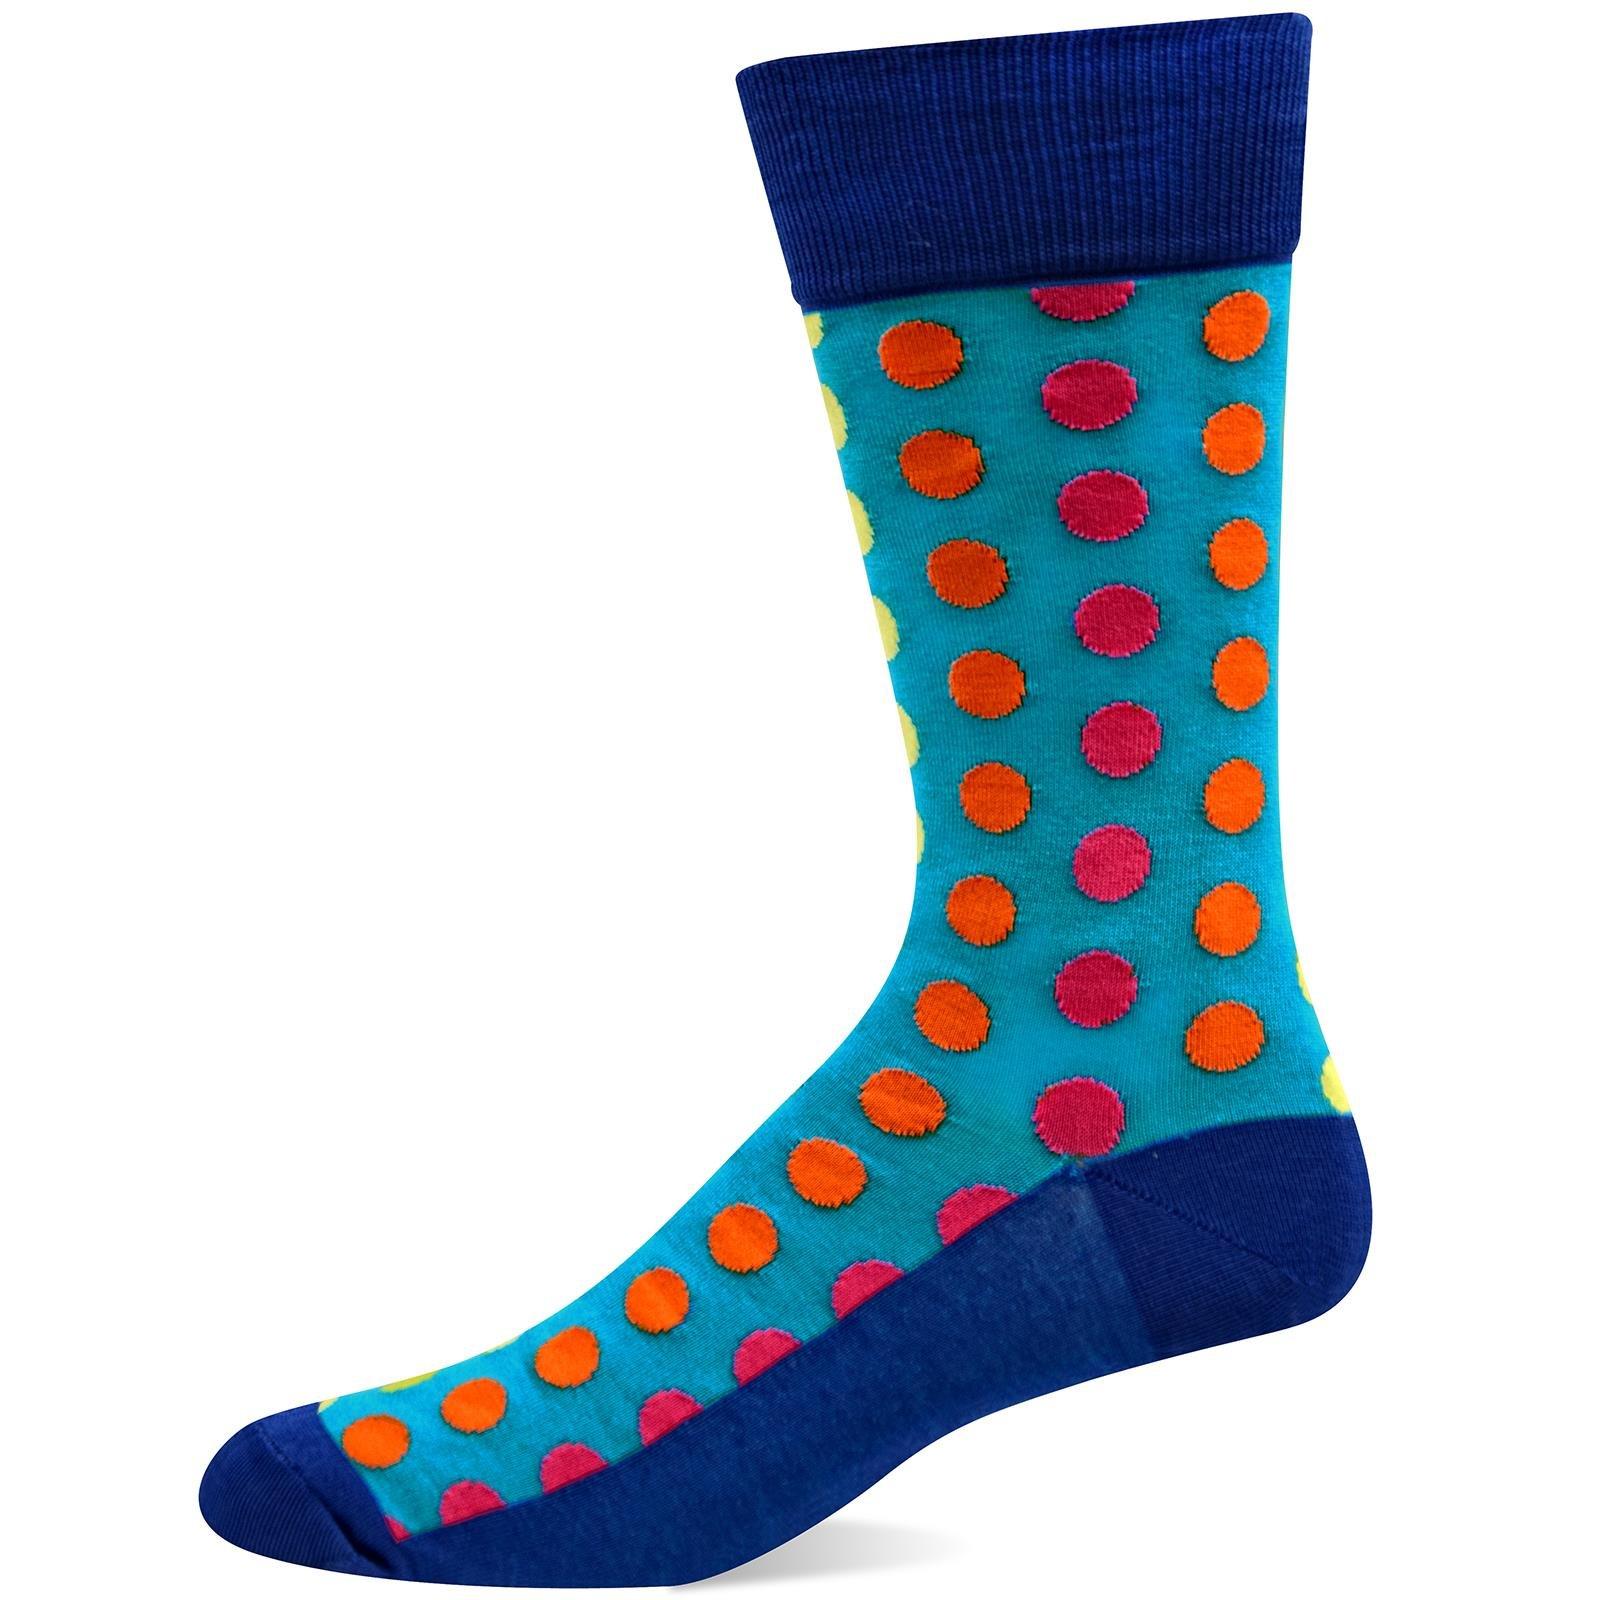 Hot Sox Men's Classic Fashion Crew Socks